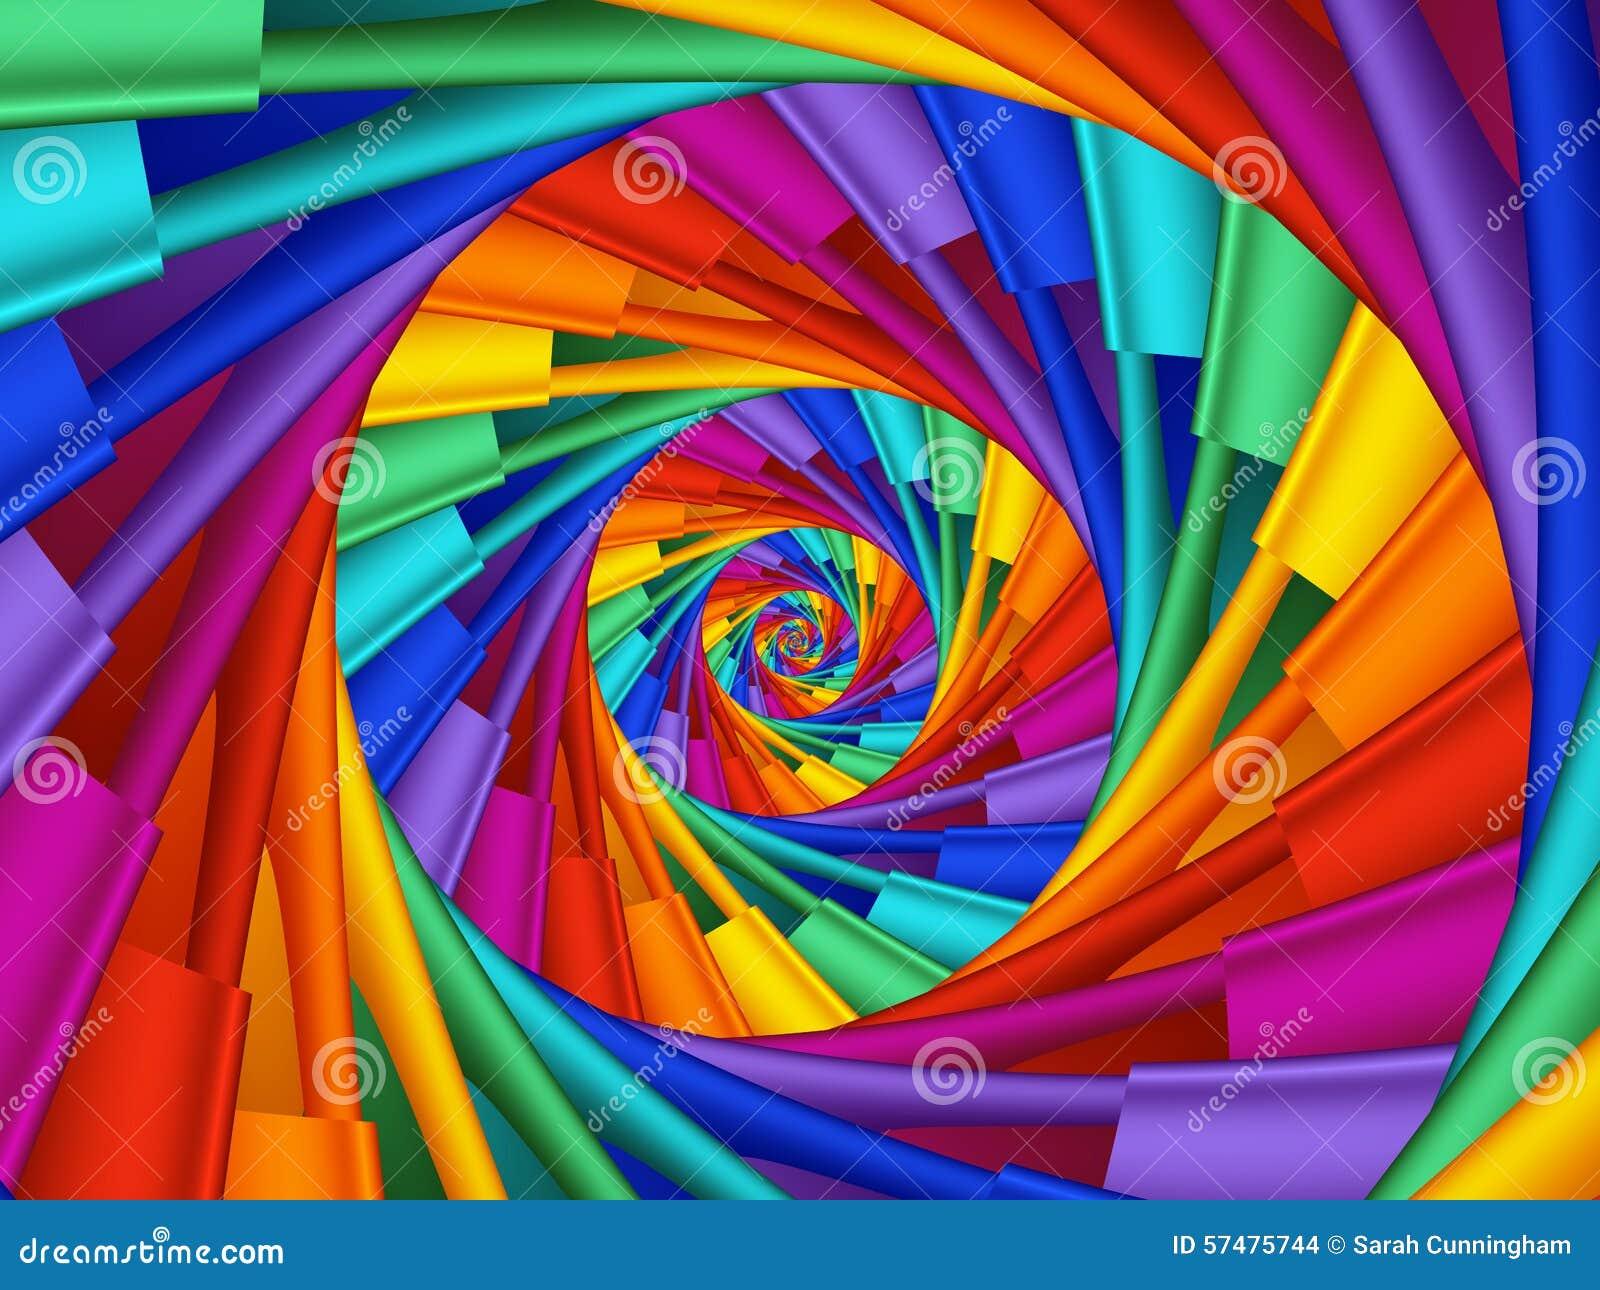 Digital Art Abstract Rainbow 3d Spiral Background Stock